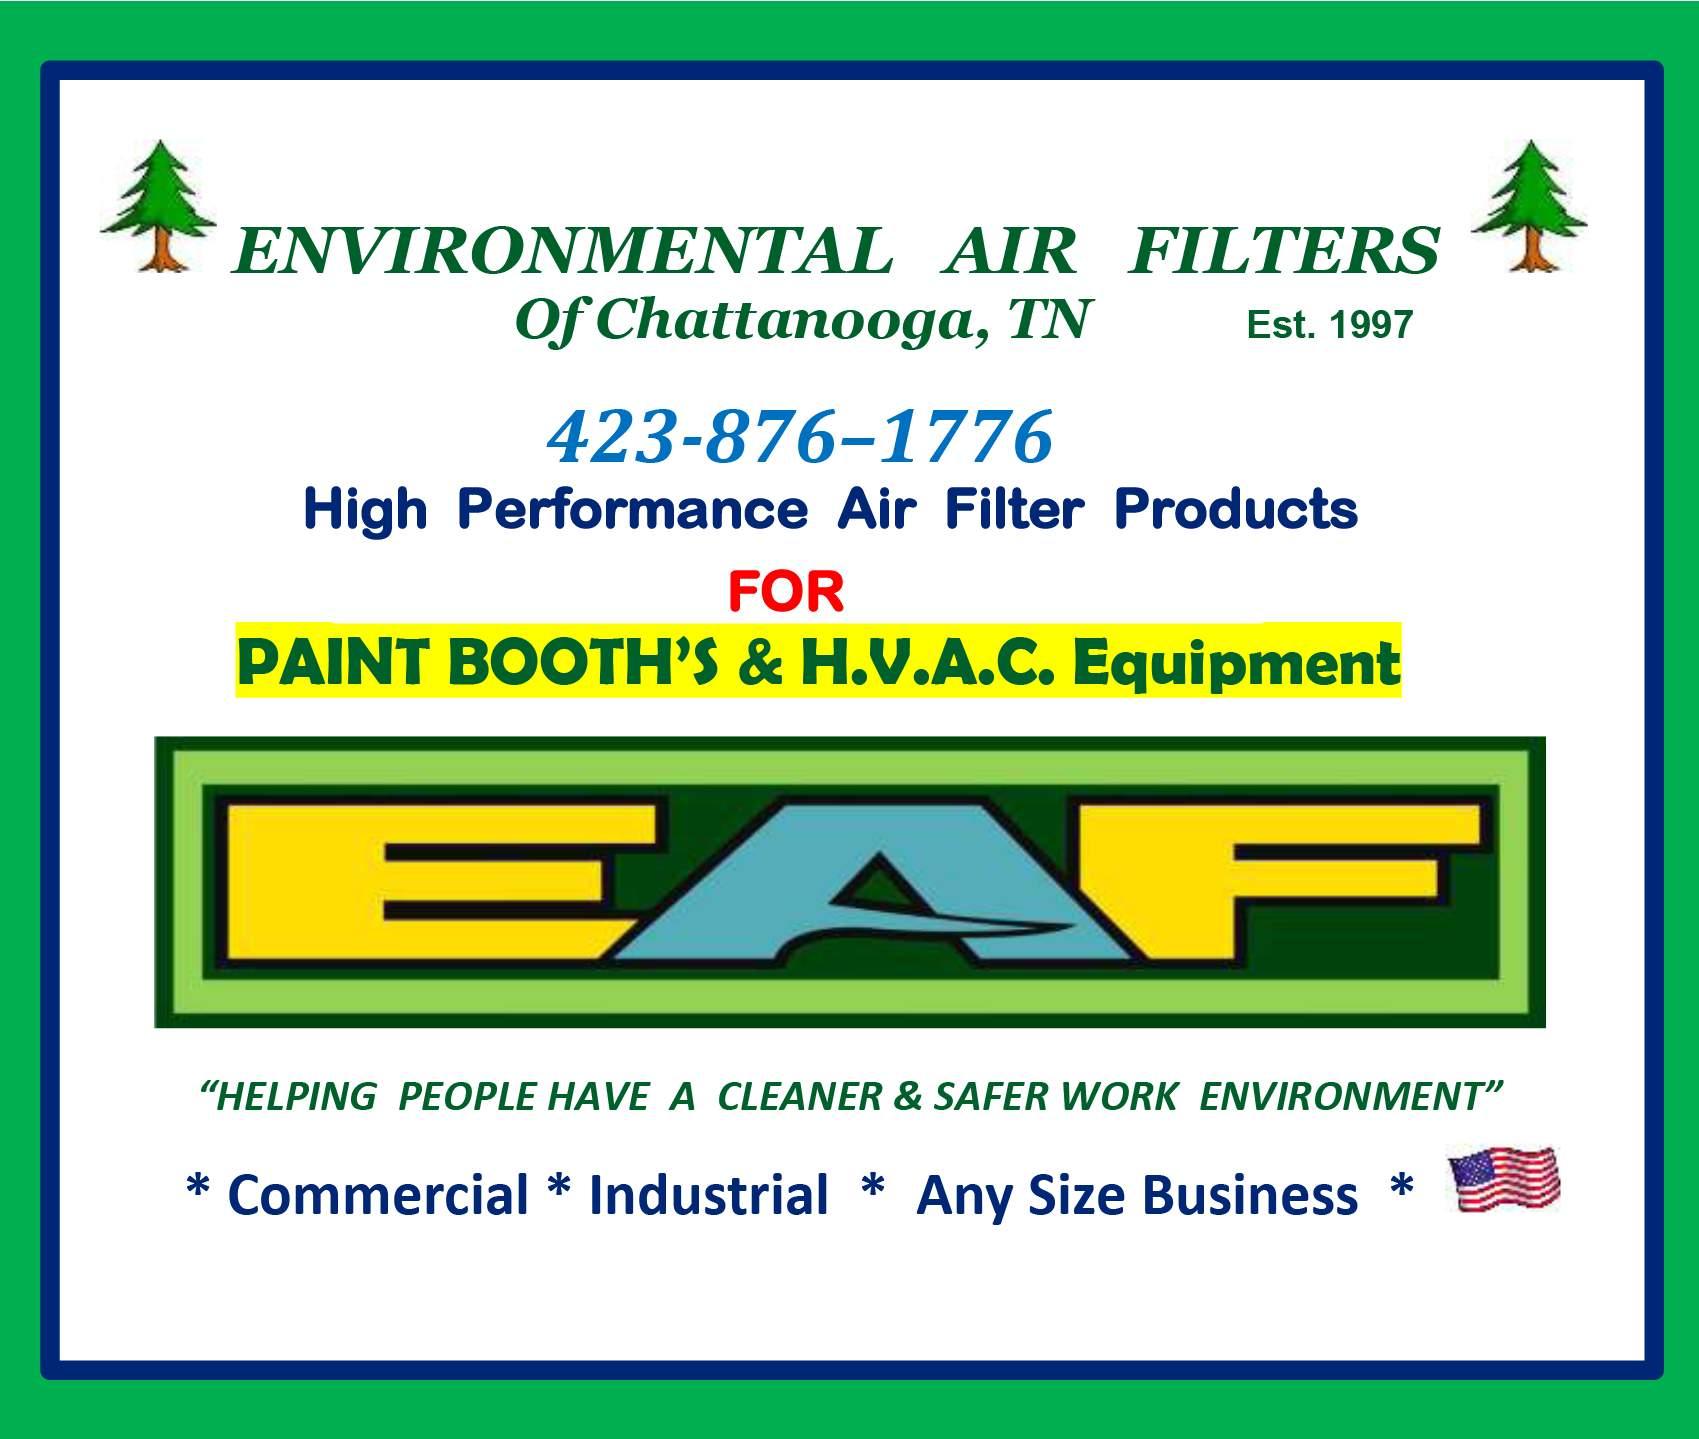 Environmental Air Filters image 1